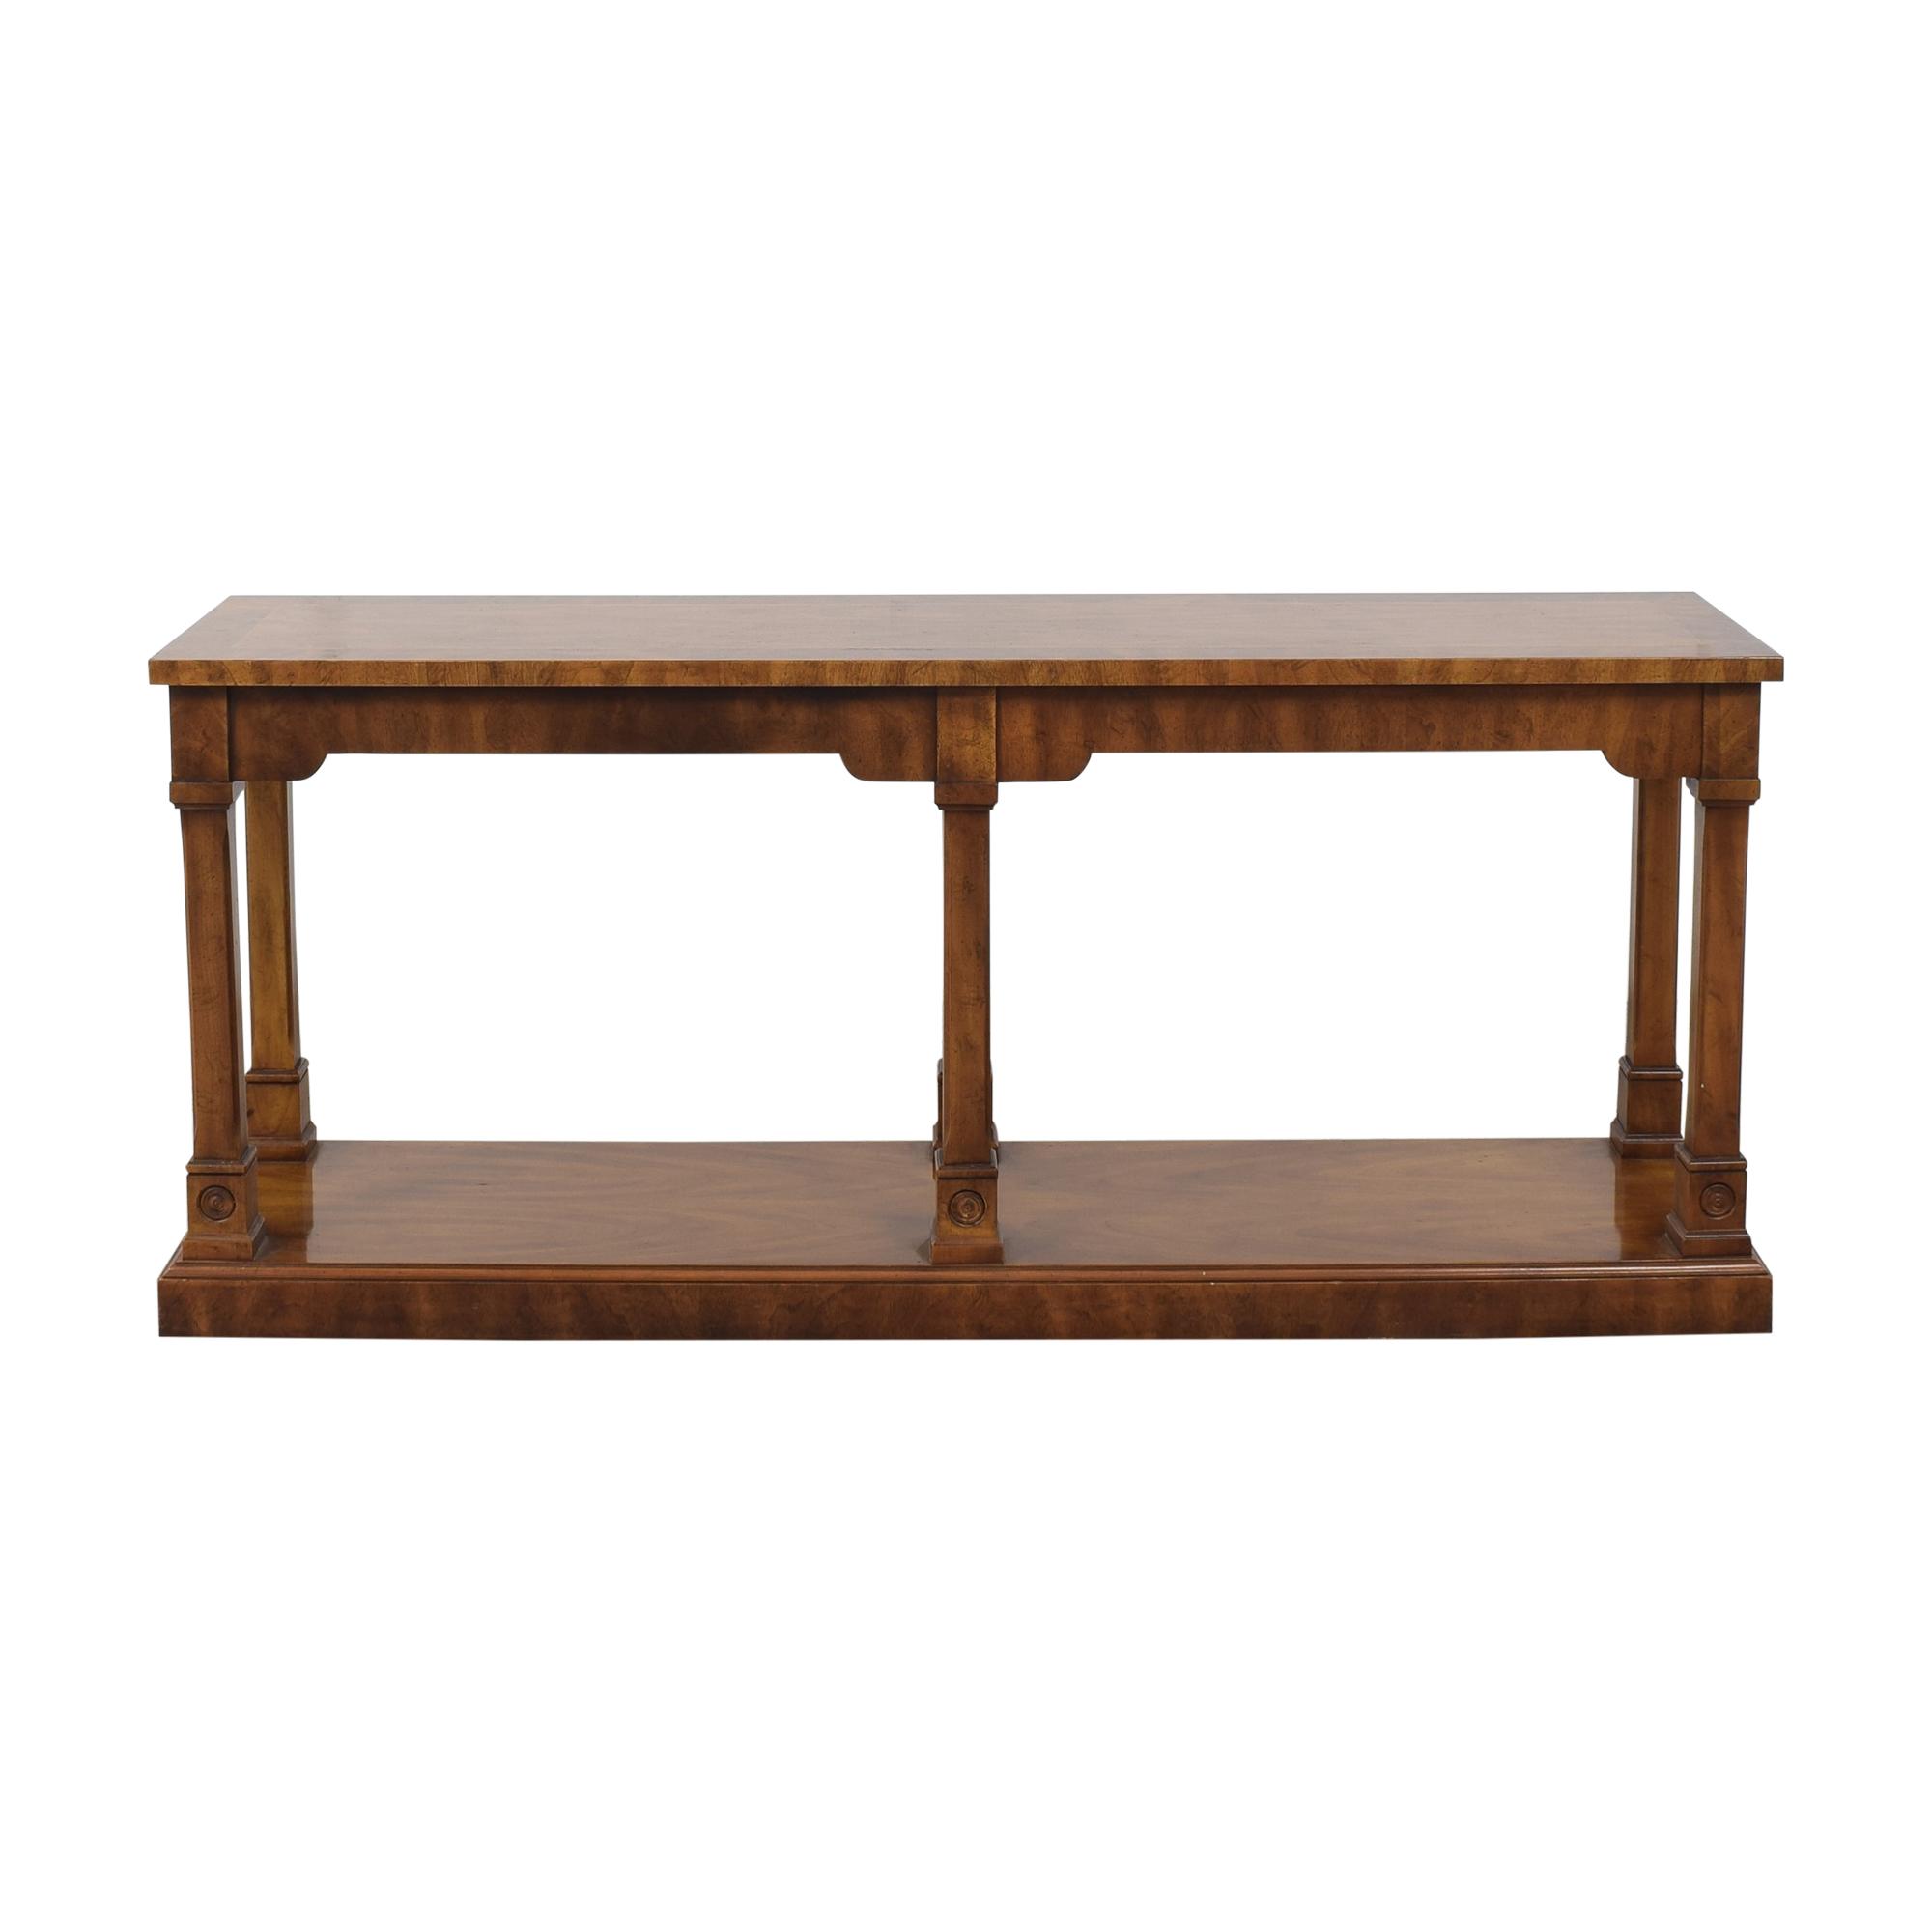 buy Drexel Heritage Console Table Drexel Heritage